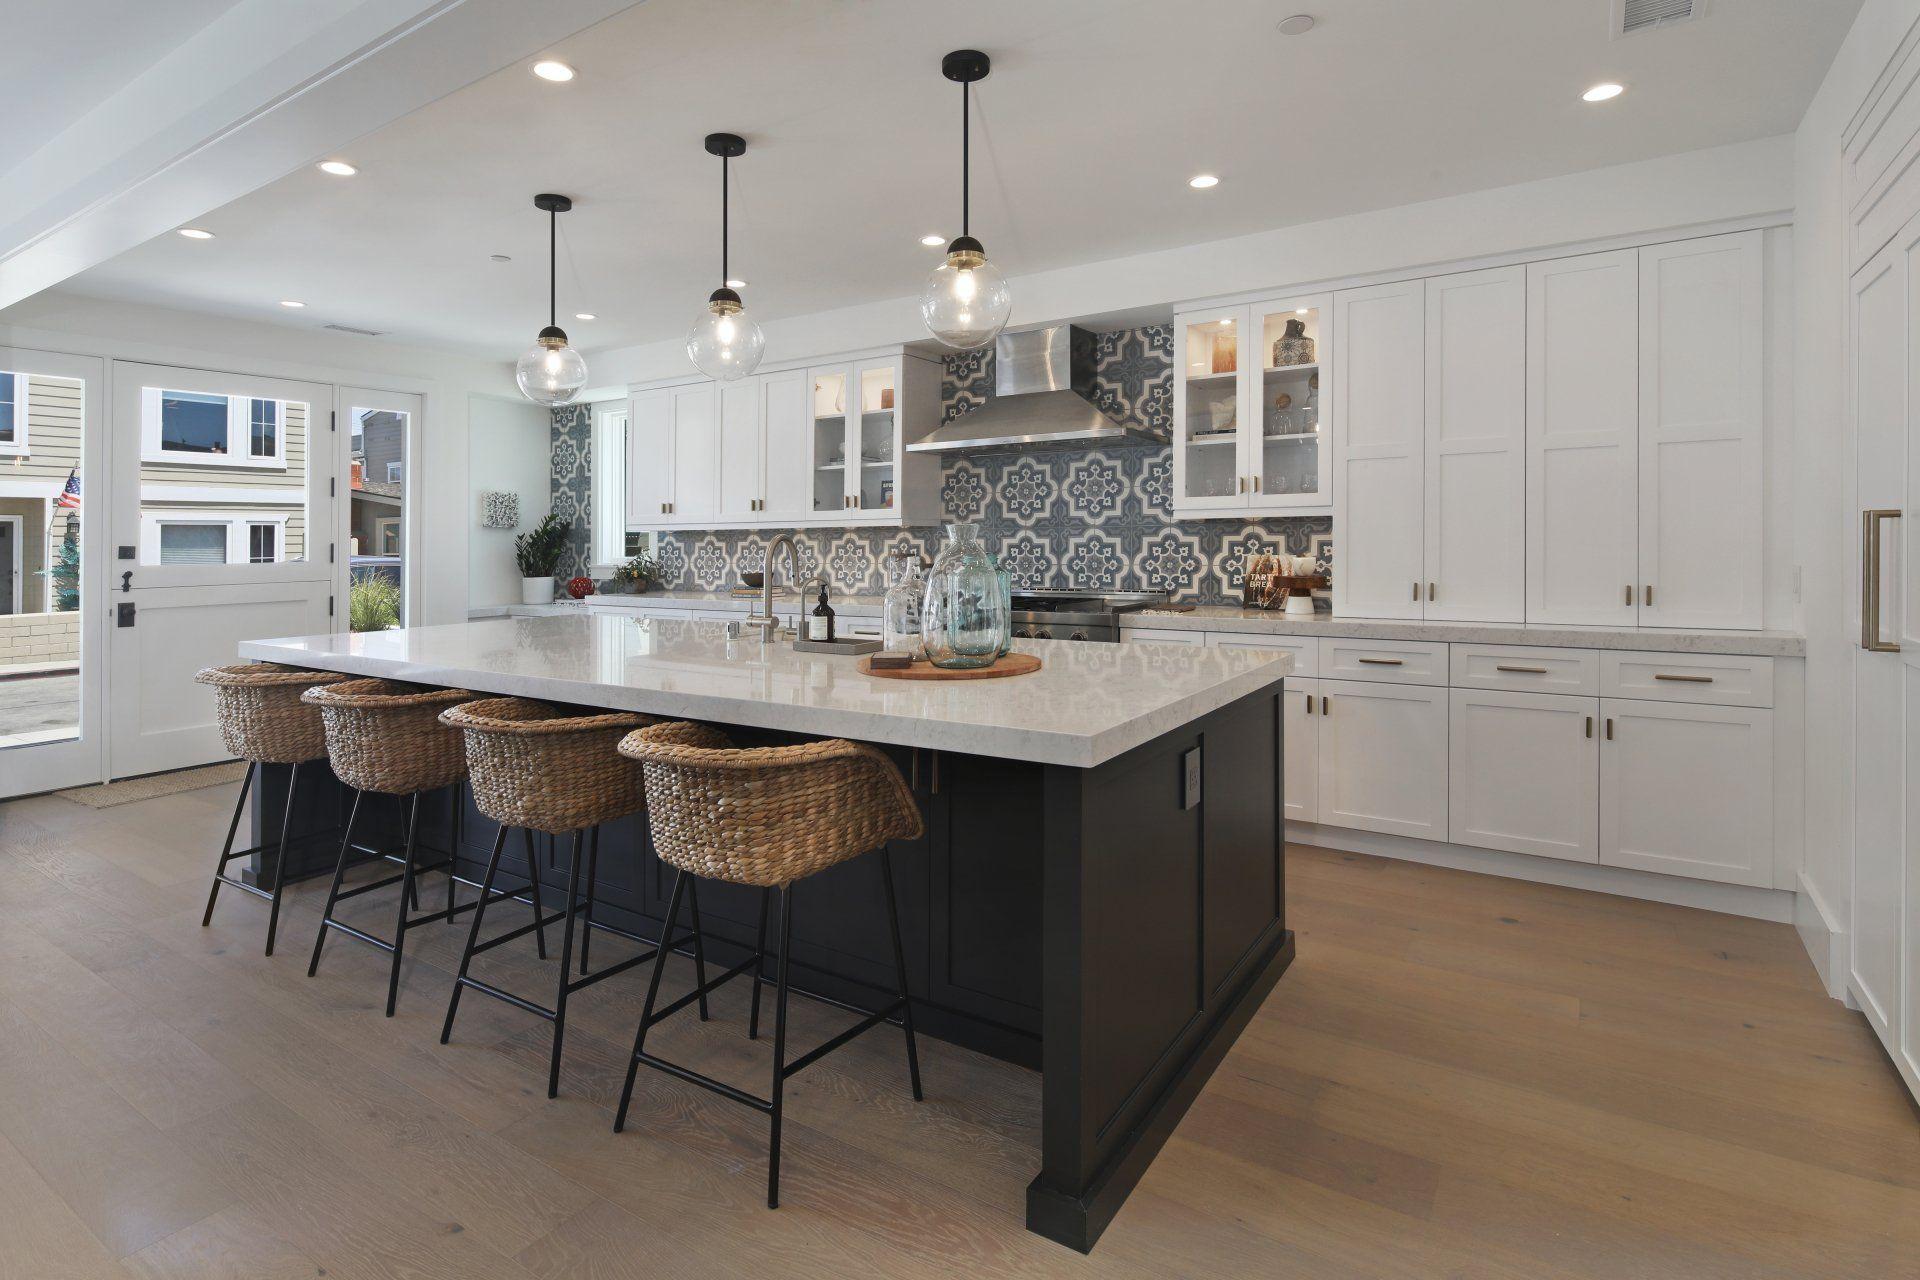 Man Made Room Furniture Kitchen Wallpaper Kitchen Furniture Kitchen Wallpaper Kitchen